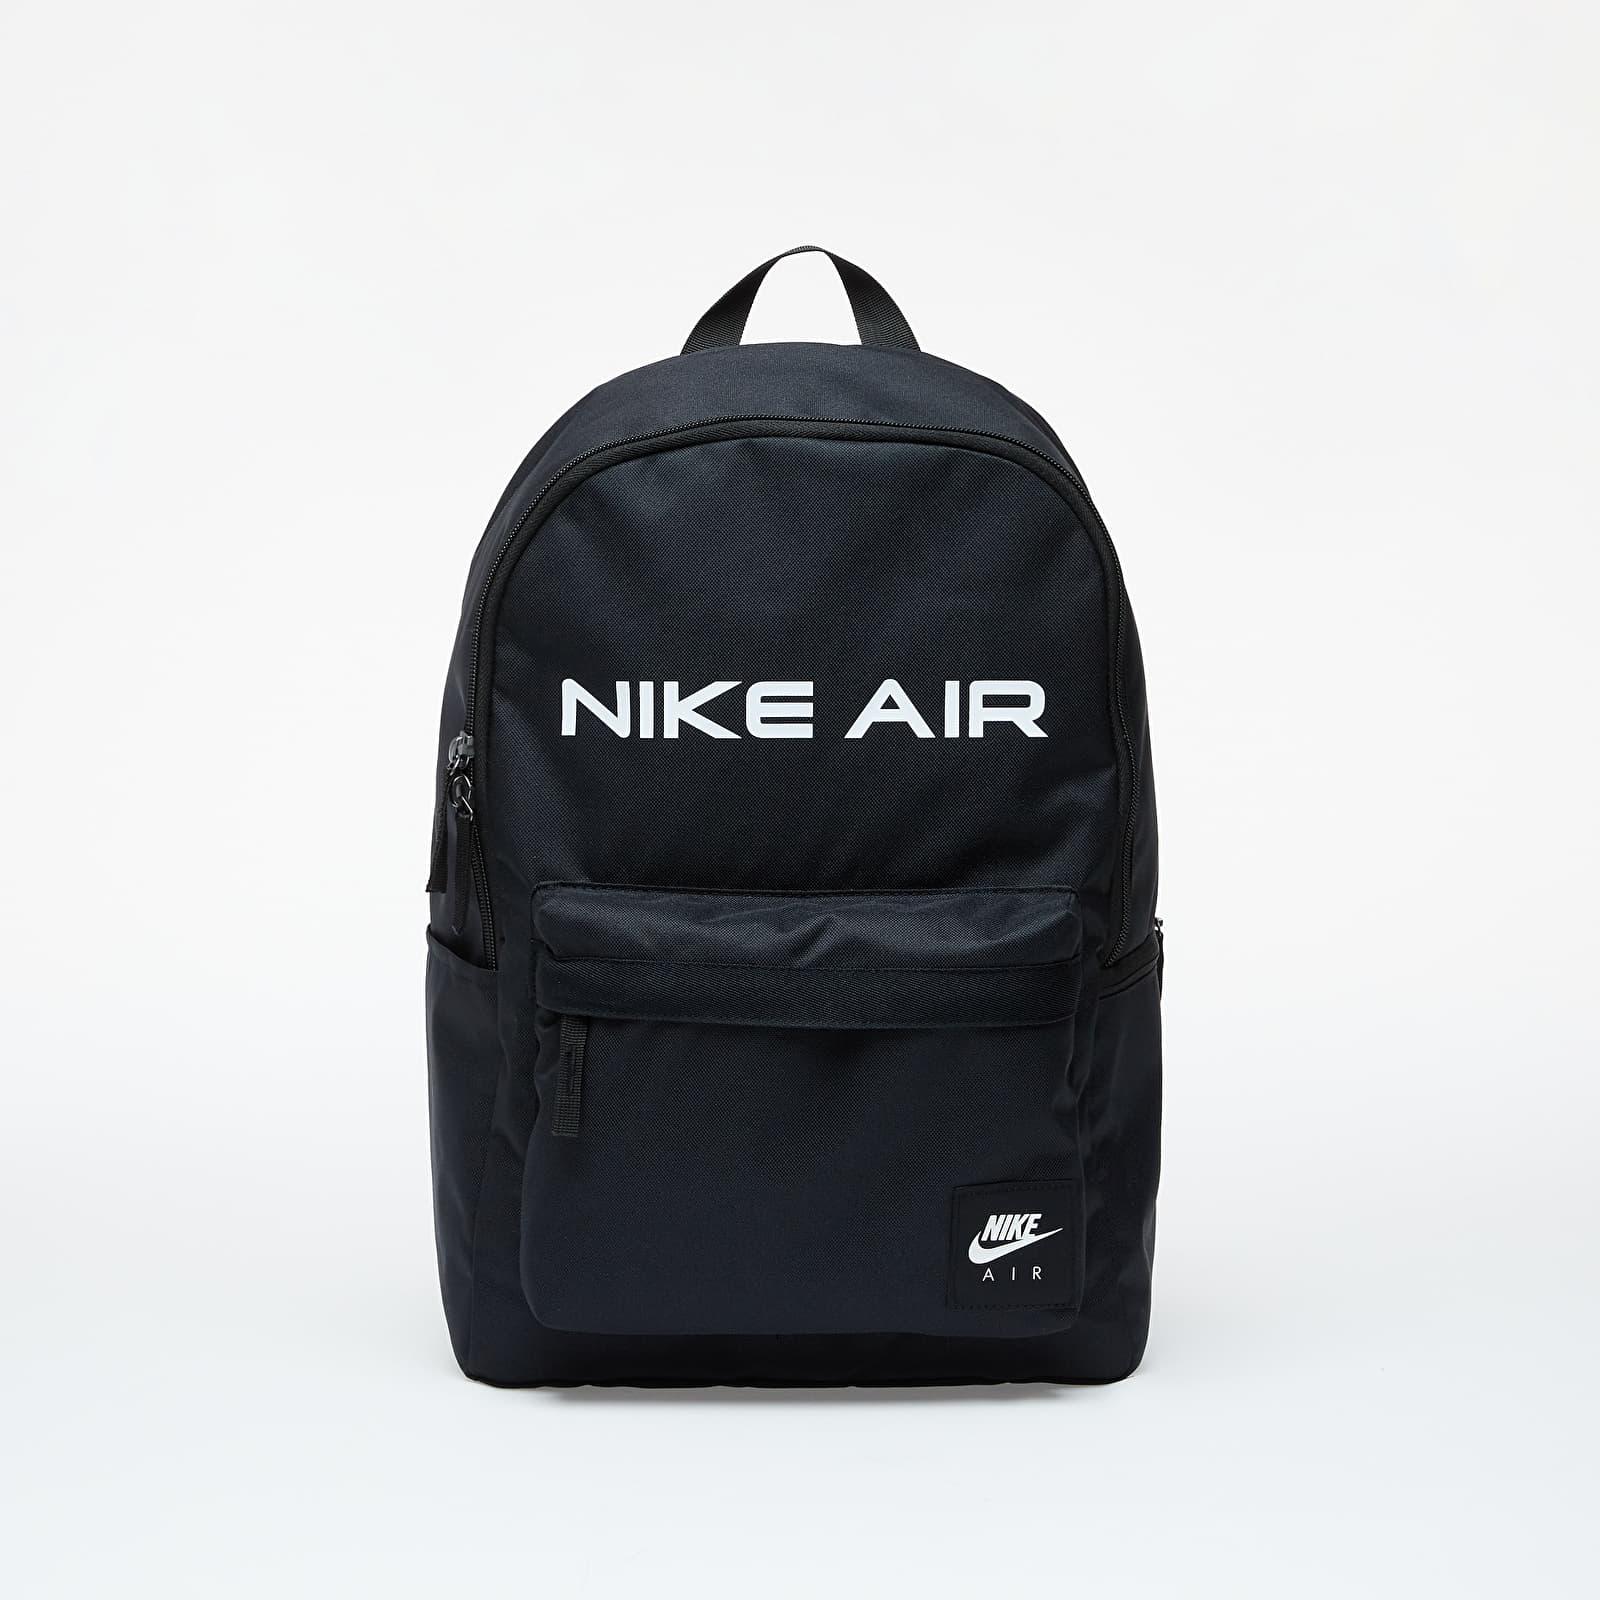 Nike Heritage Backpack - Nike Air Black/ Black/ White EUR